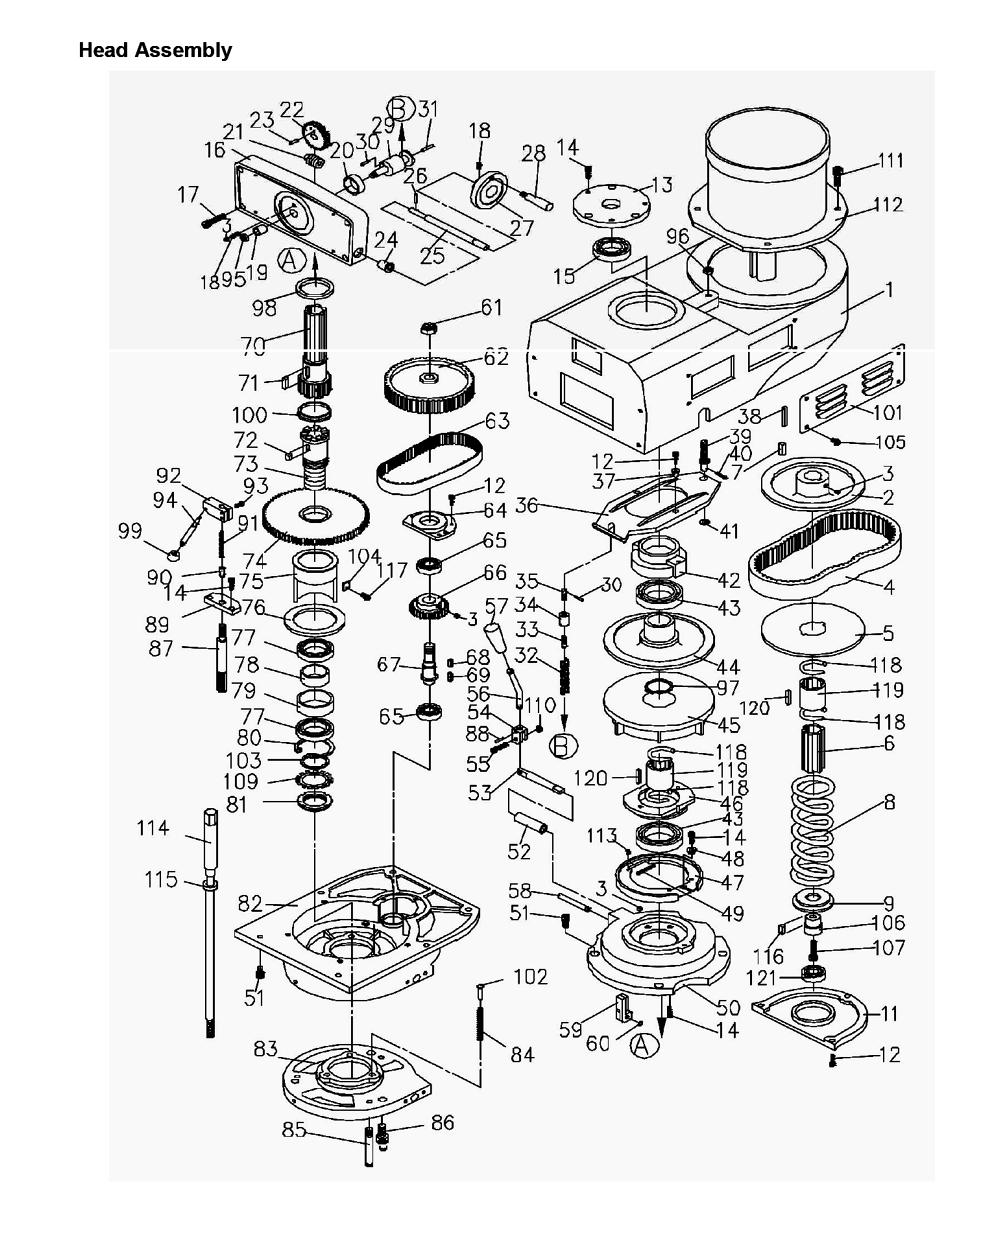 bridgeport milling machine lubrication diagram jet milling